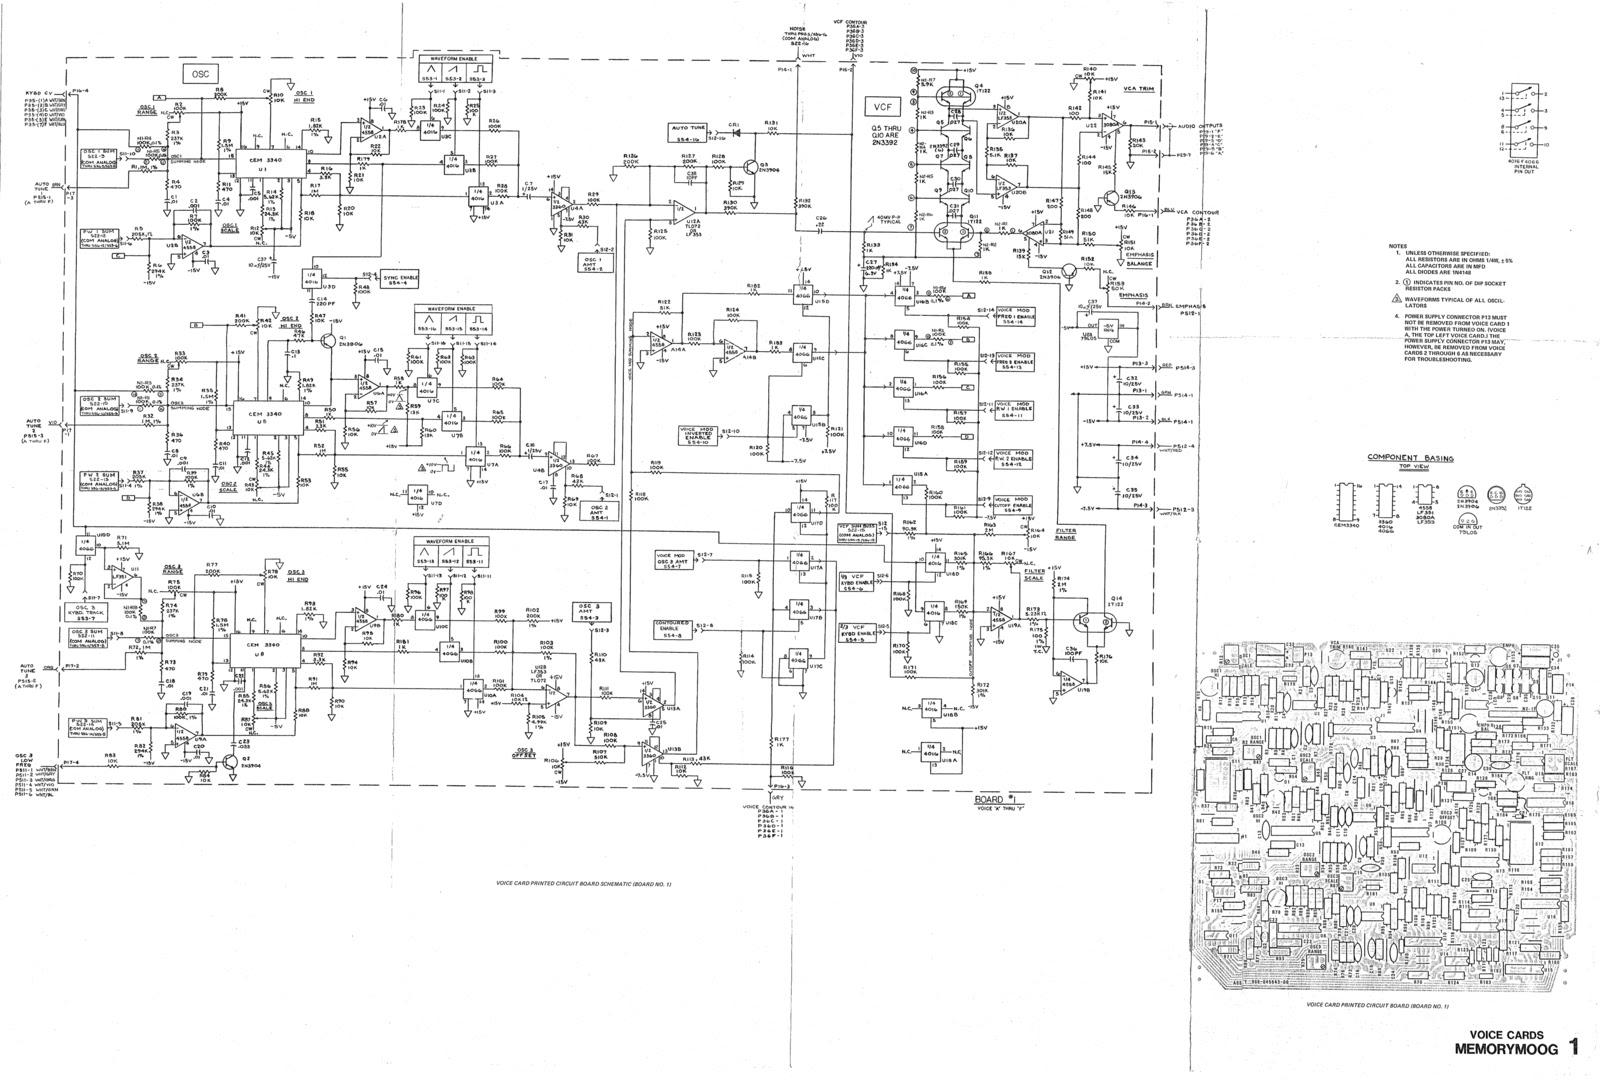 Matrixsynth Memorymoog Schematics Circuit Board